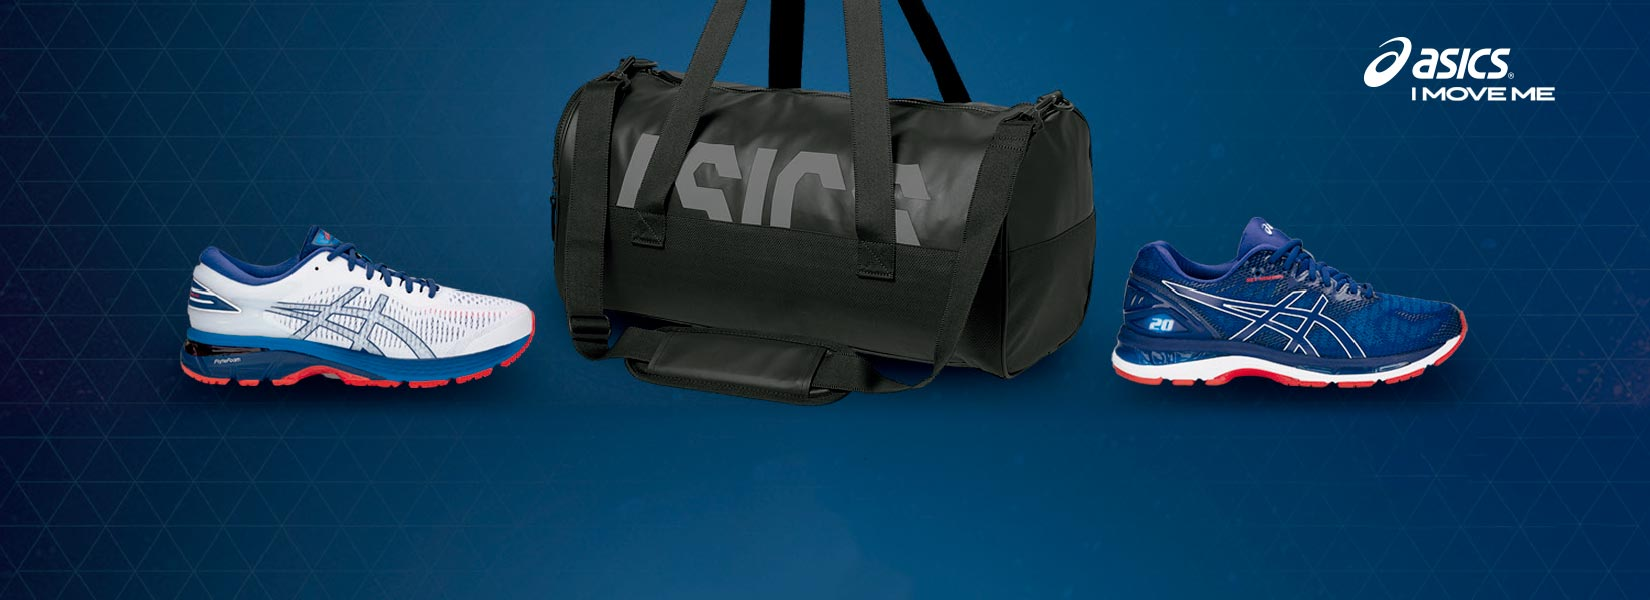 Recive a free Asics bag